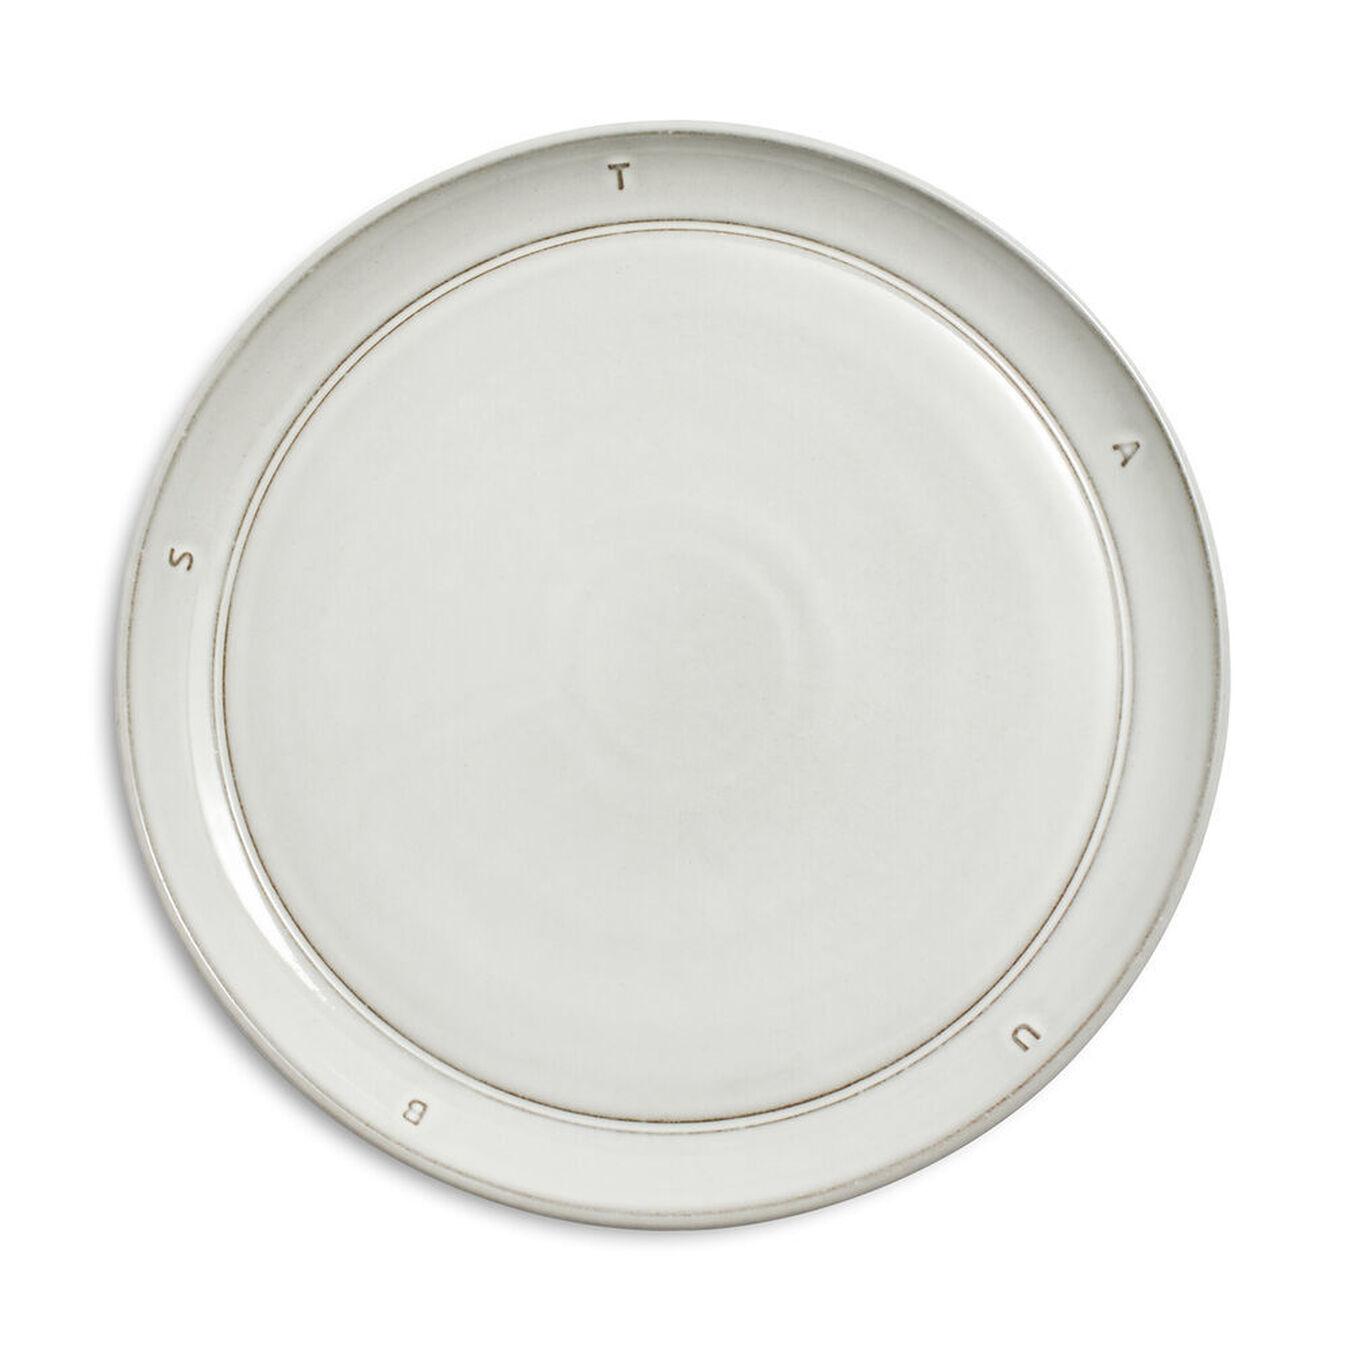 "Ceramic Salad Plate 22cm / 8.6"" - Off White,,large 1"